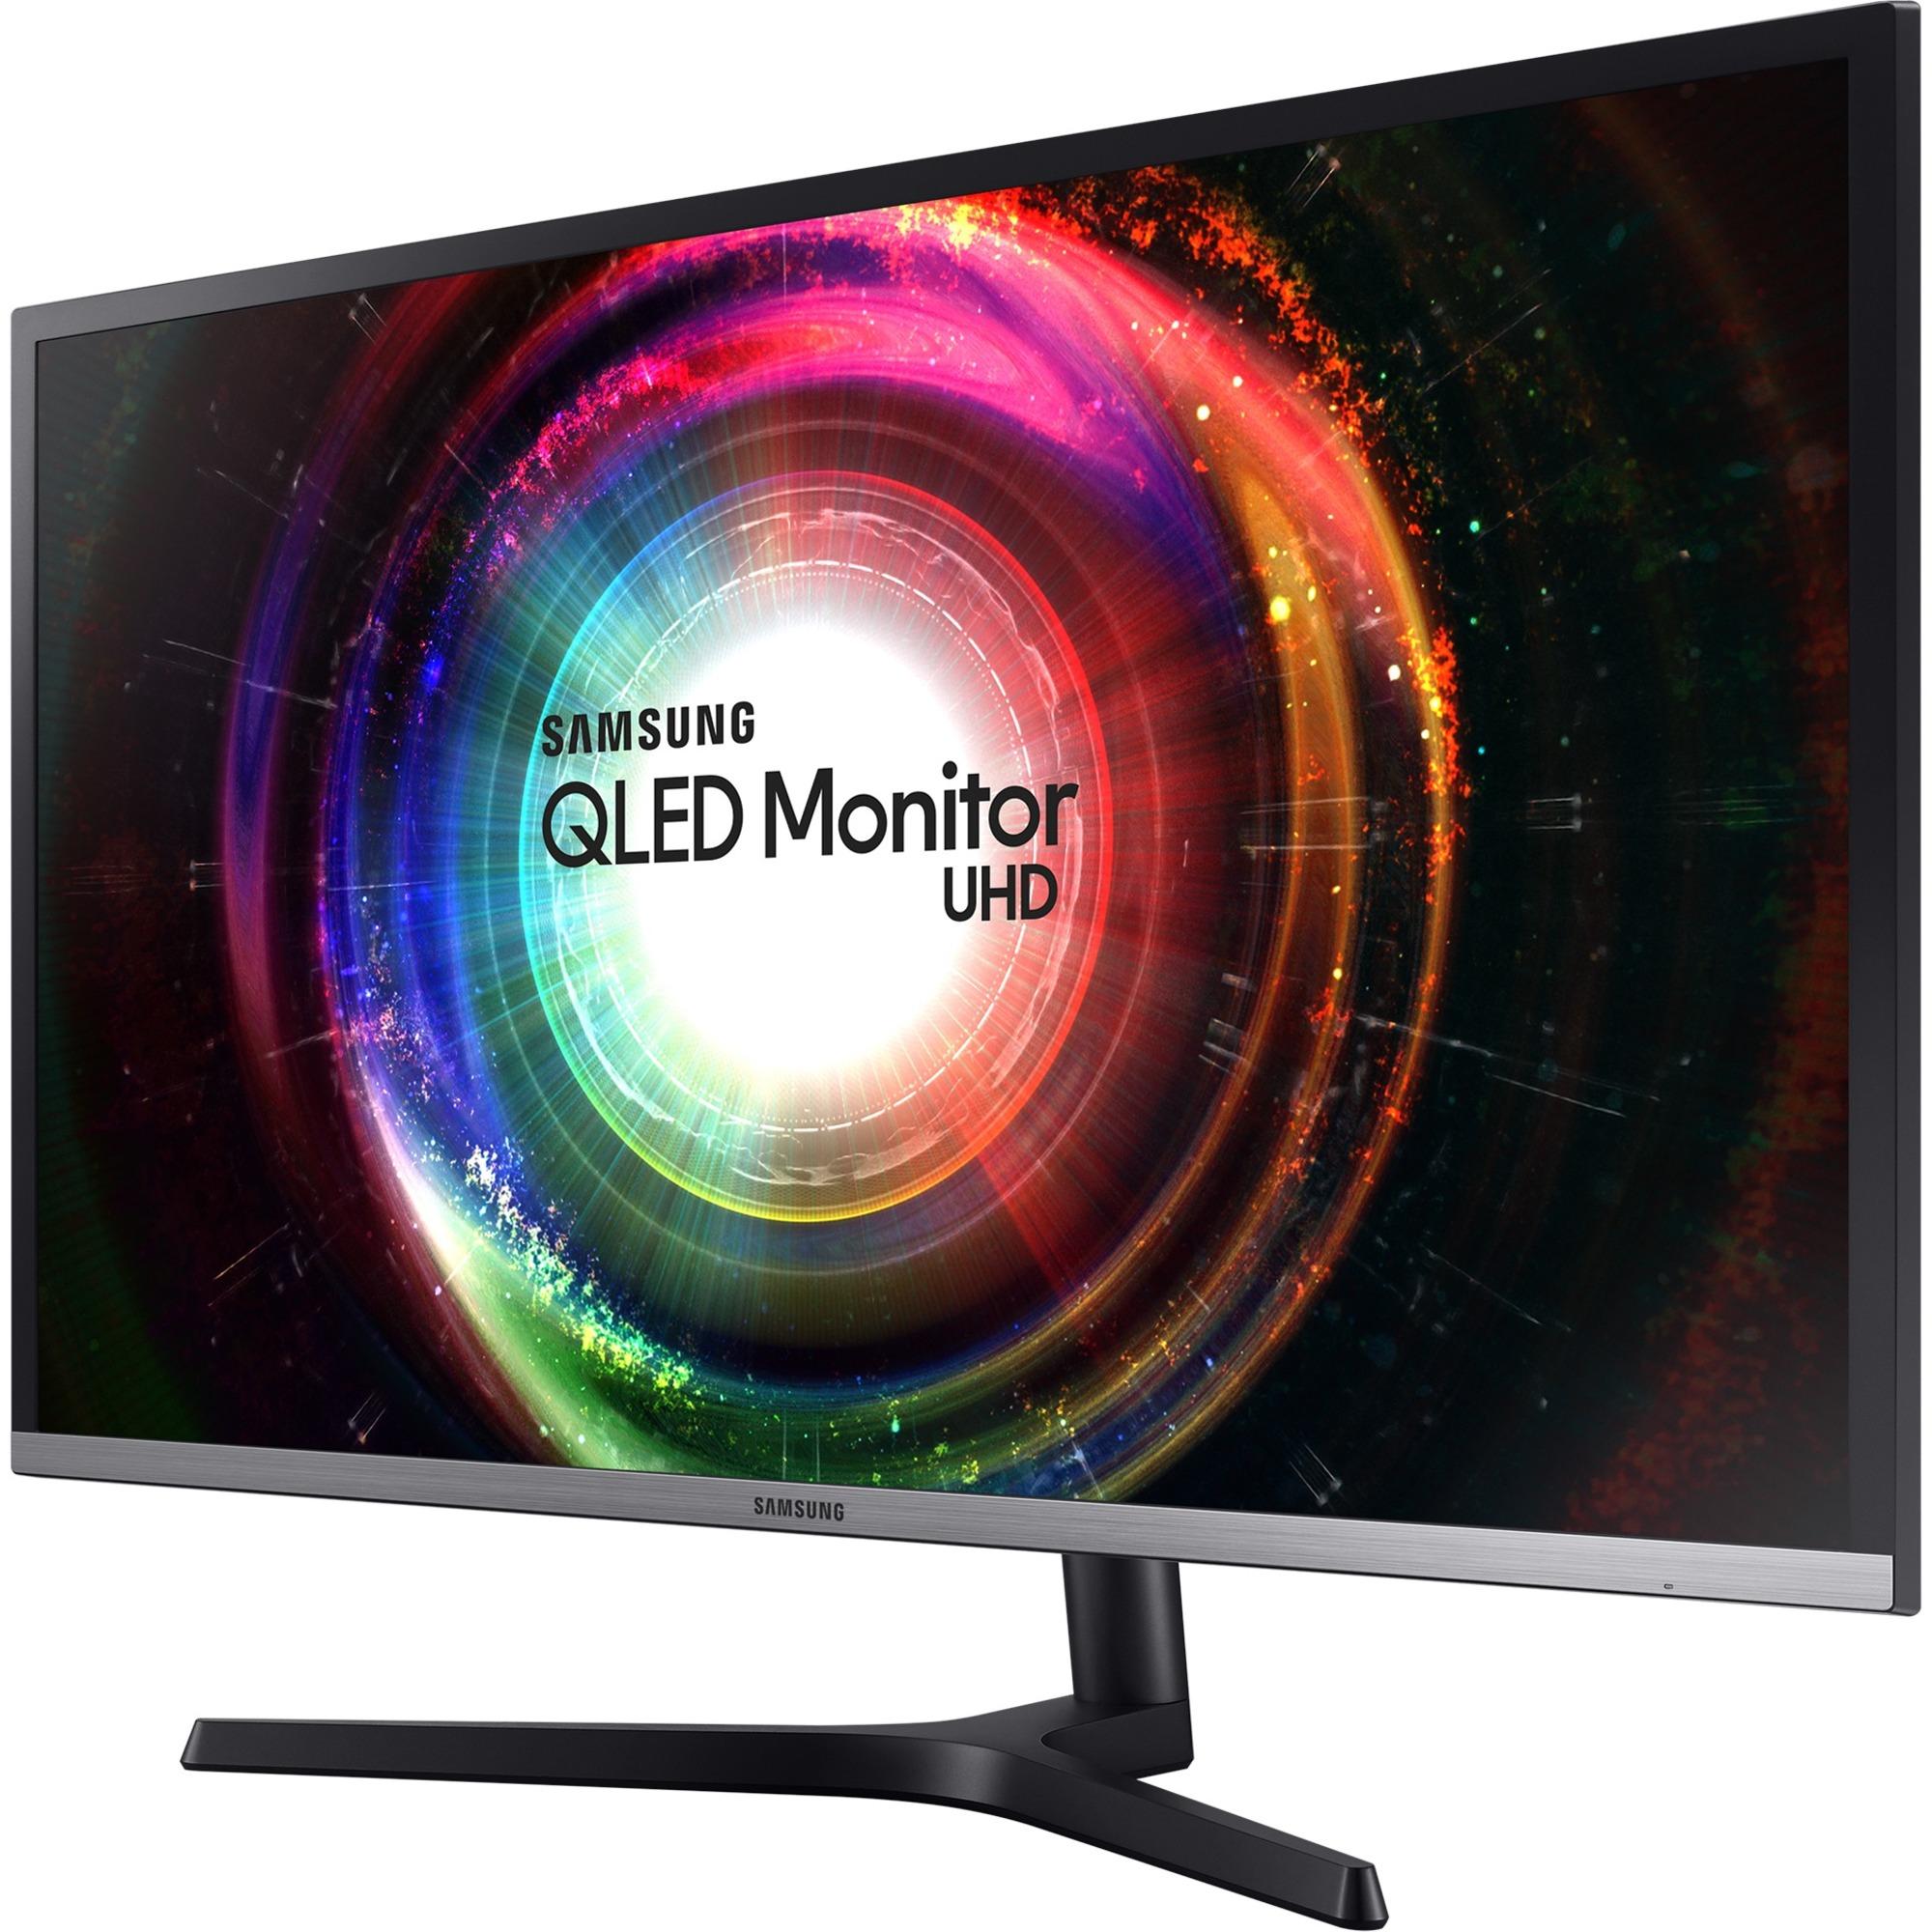 "Samsung U32H850UMN 31.5"" 4K UHD Quantum Dot LED LCD Monitor - 16:9 - Black, Silver_subImage_1"